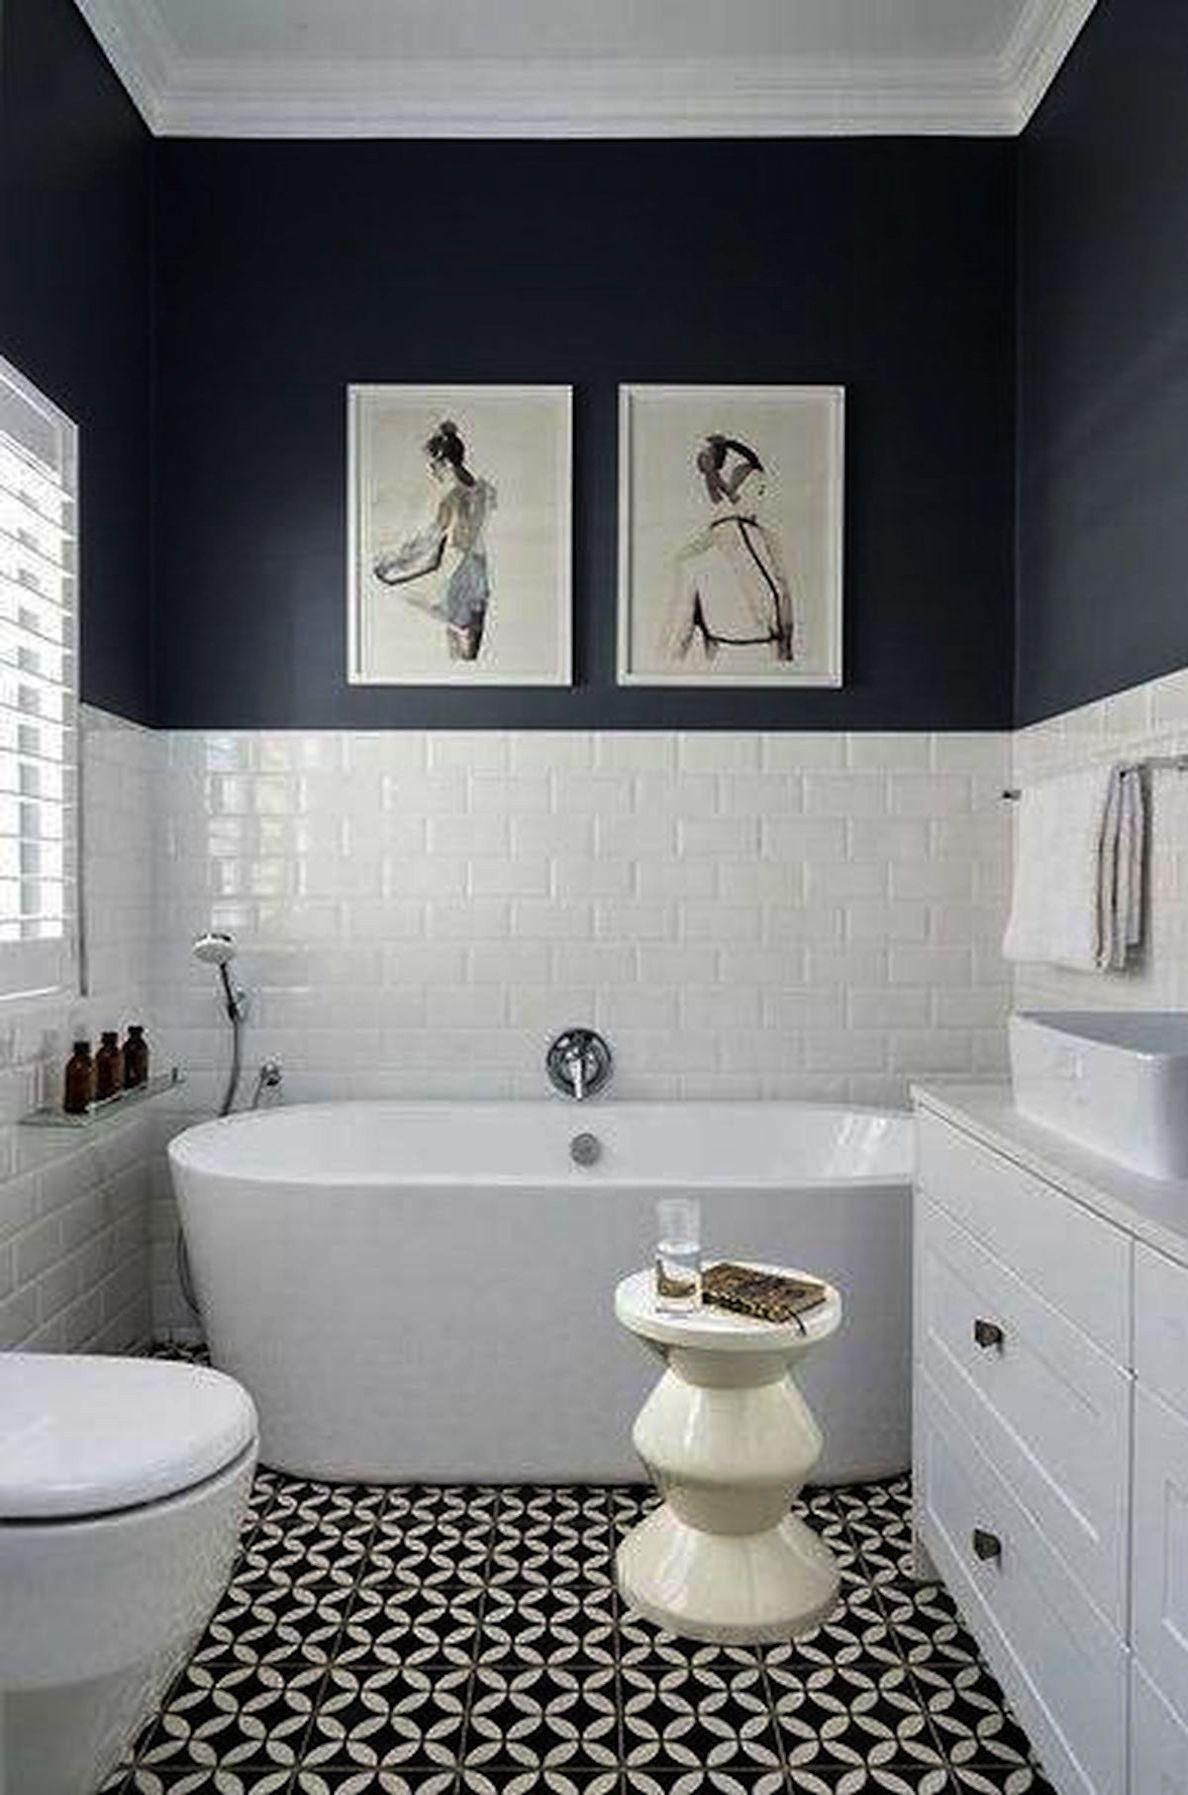 Bathroom Ideas Rustic Modern Save Small Ensuite Bathroom Ideas Uk Amid Bathroom Plant Ideas Small Bathroom Makeover Master Bathroom Renovation Trendy Bathroom